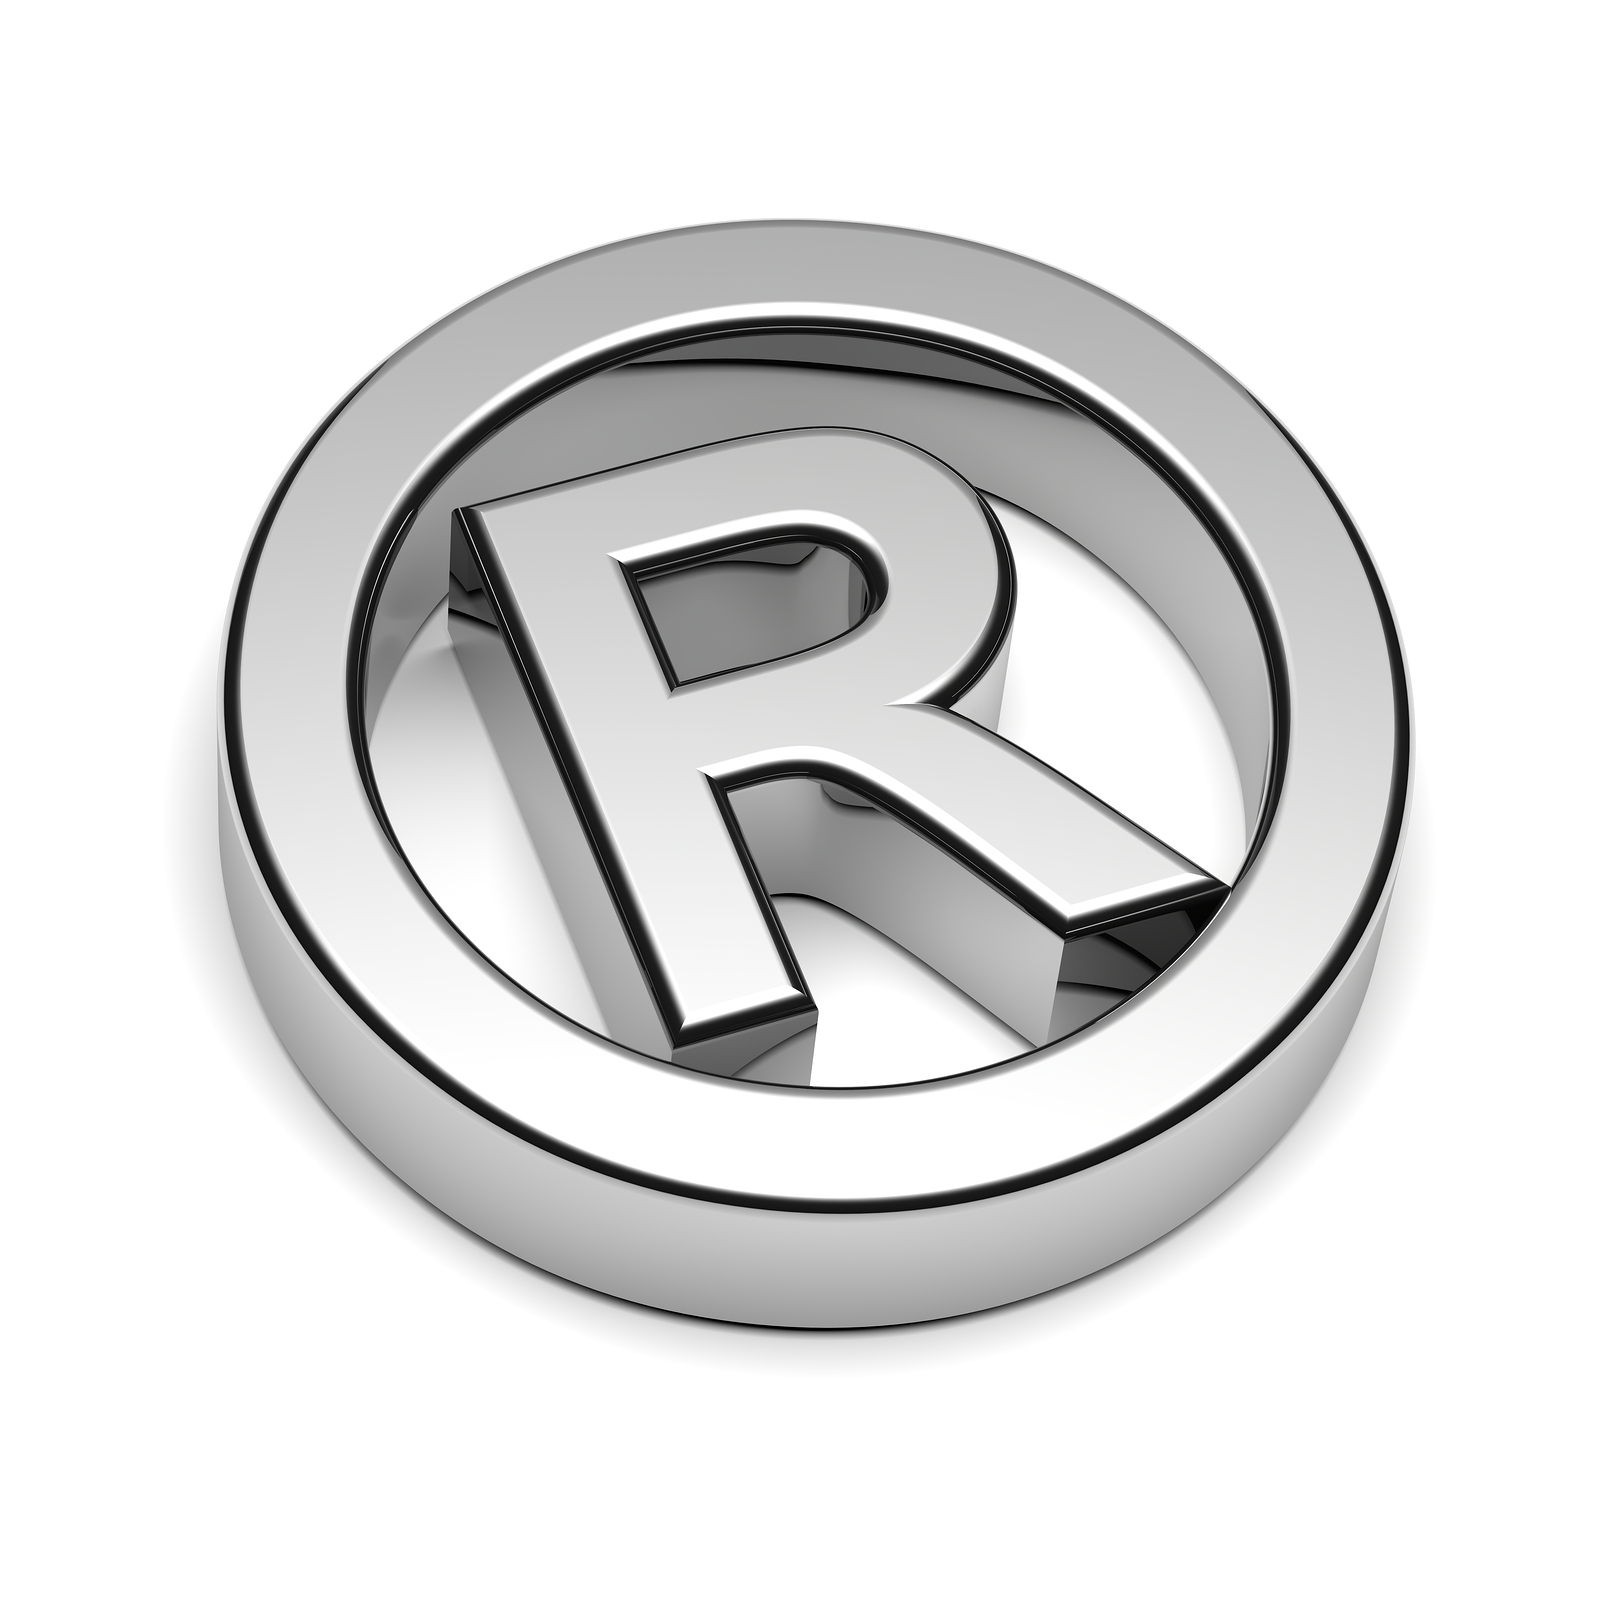 Advanced Trademarks Information